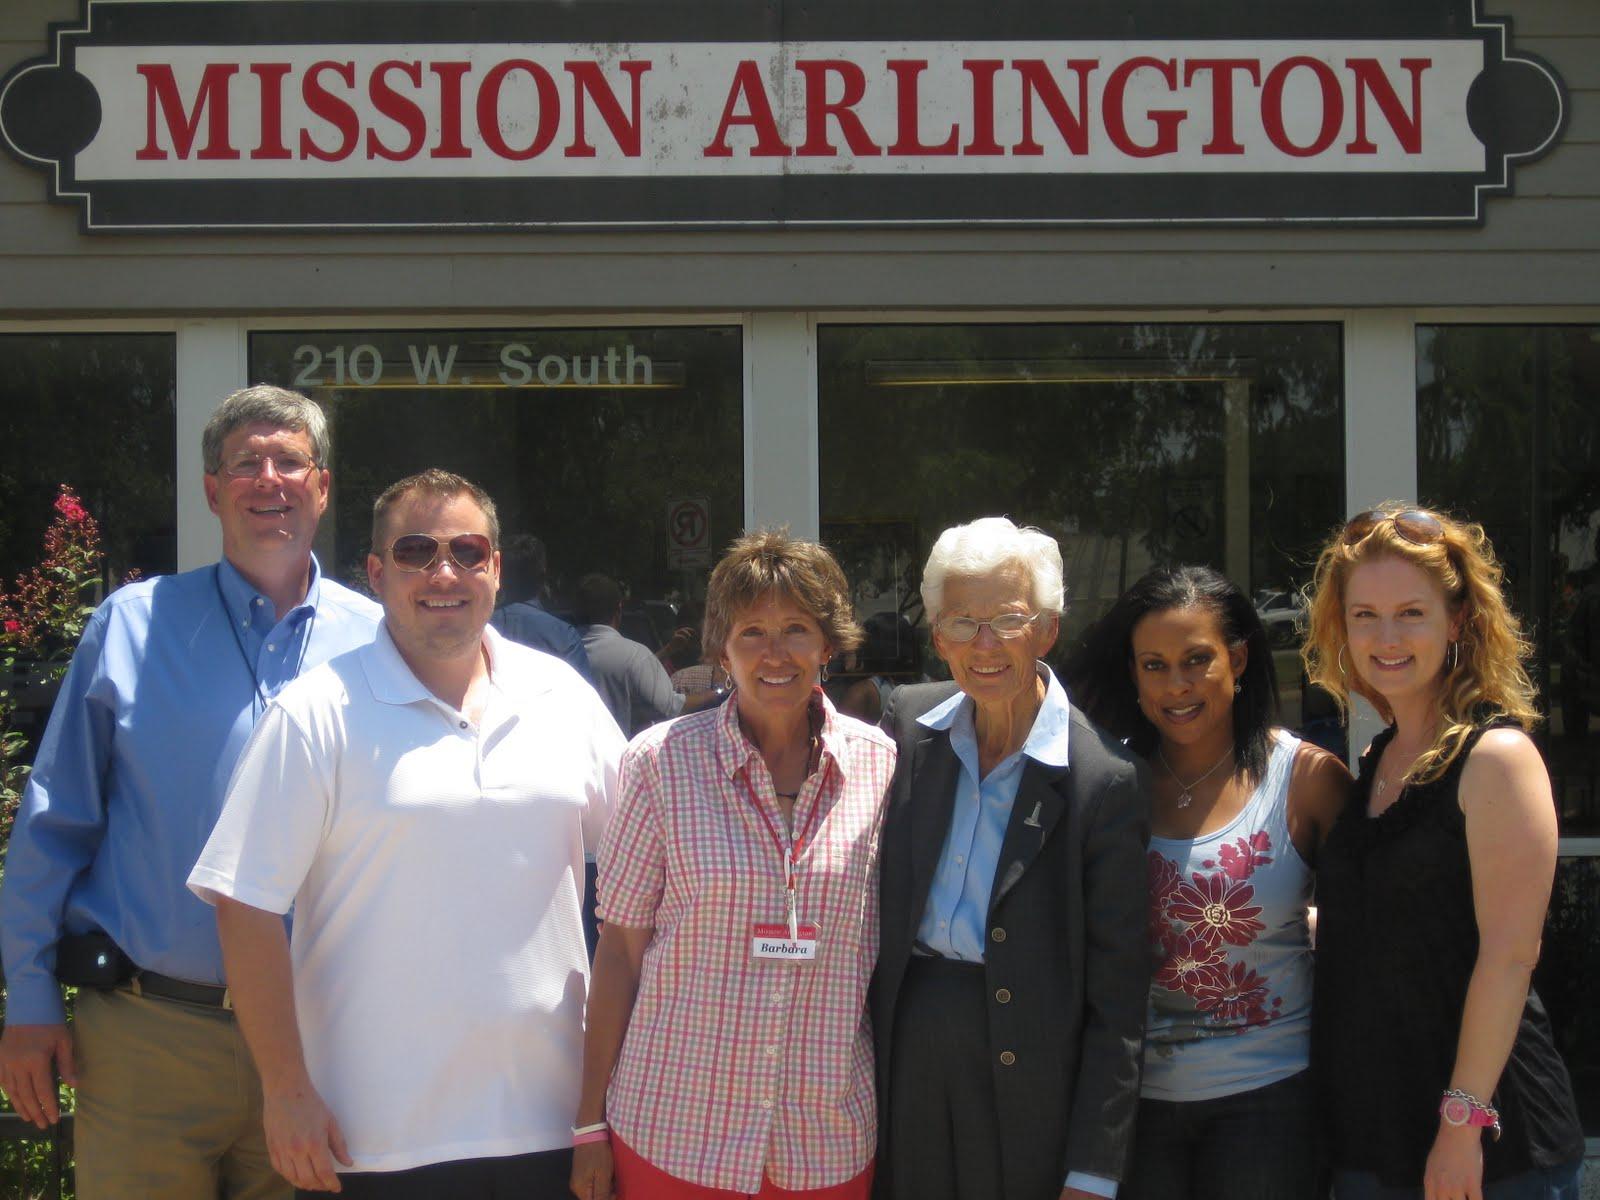 Mission Arlington Organization